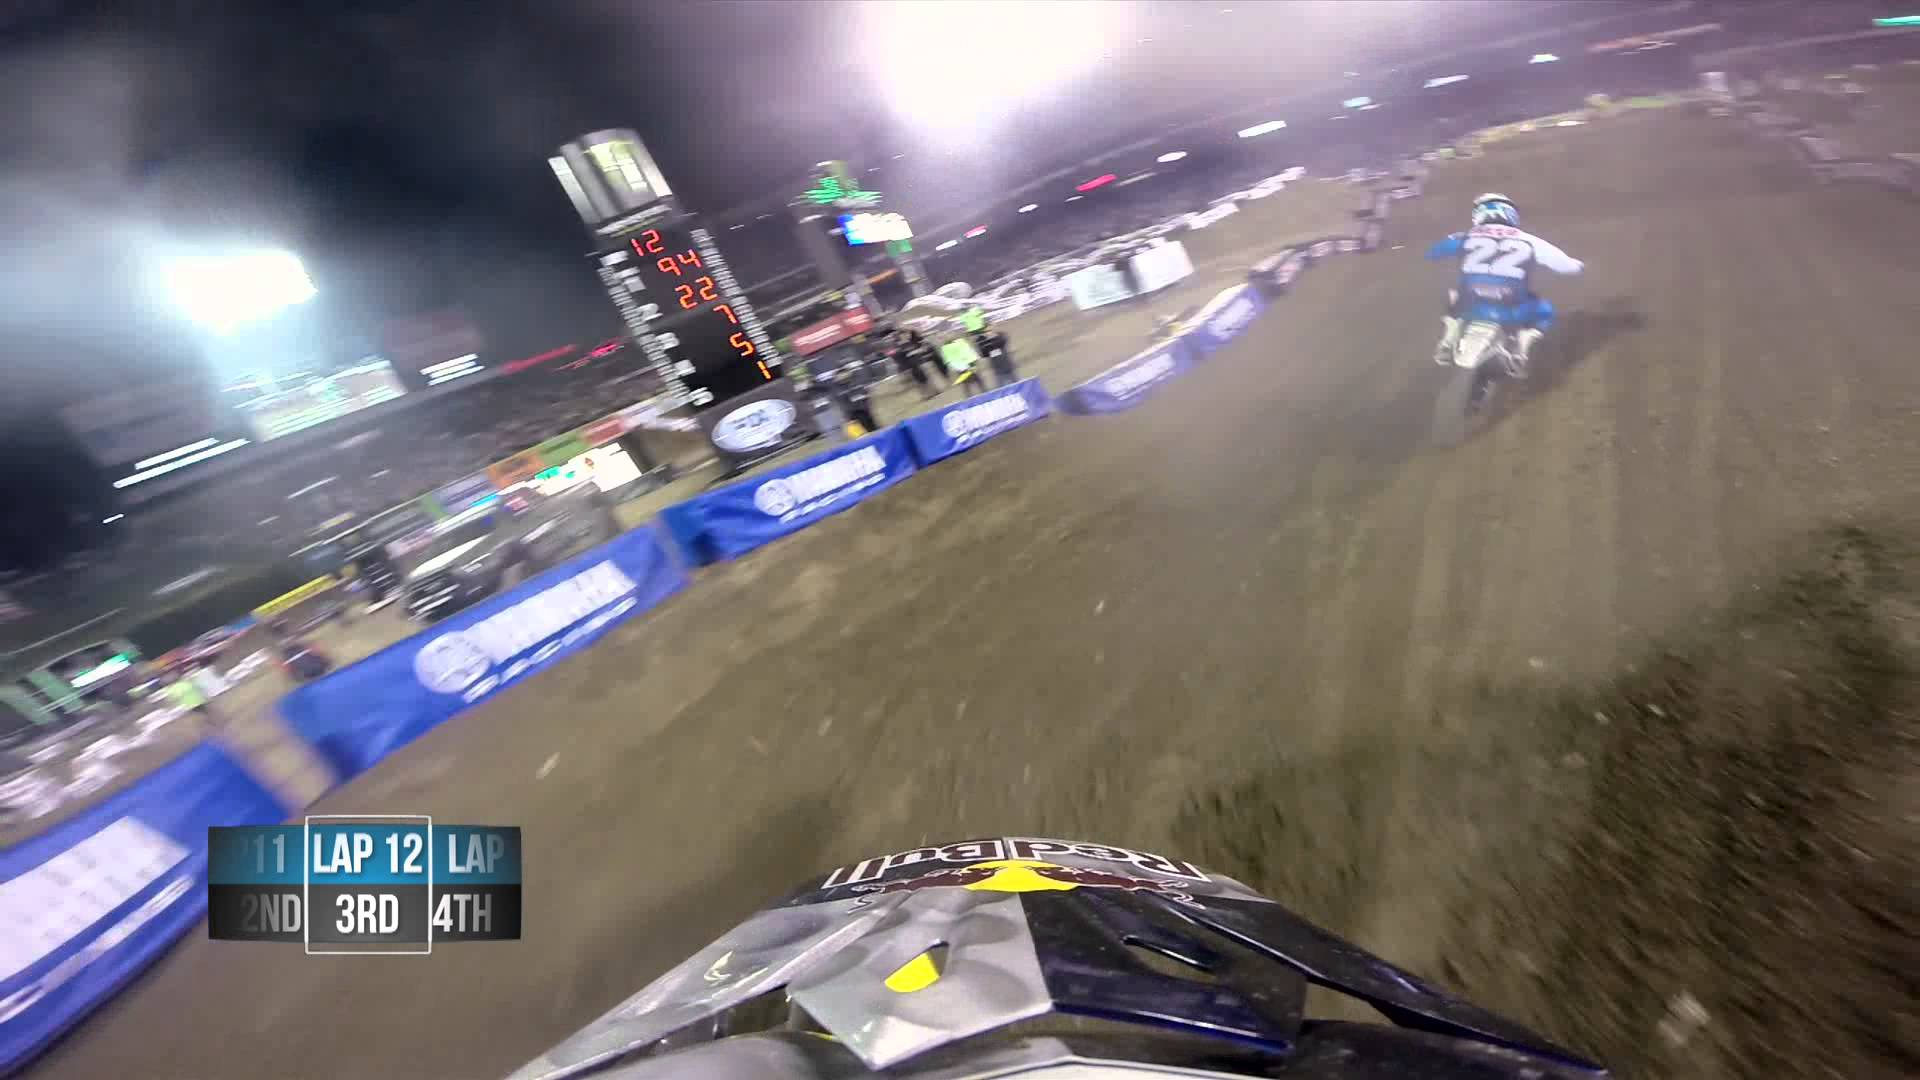 James Stewart Main Event 2014 Monster Energy Supercross from Anaheim - GoPro